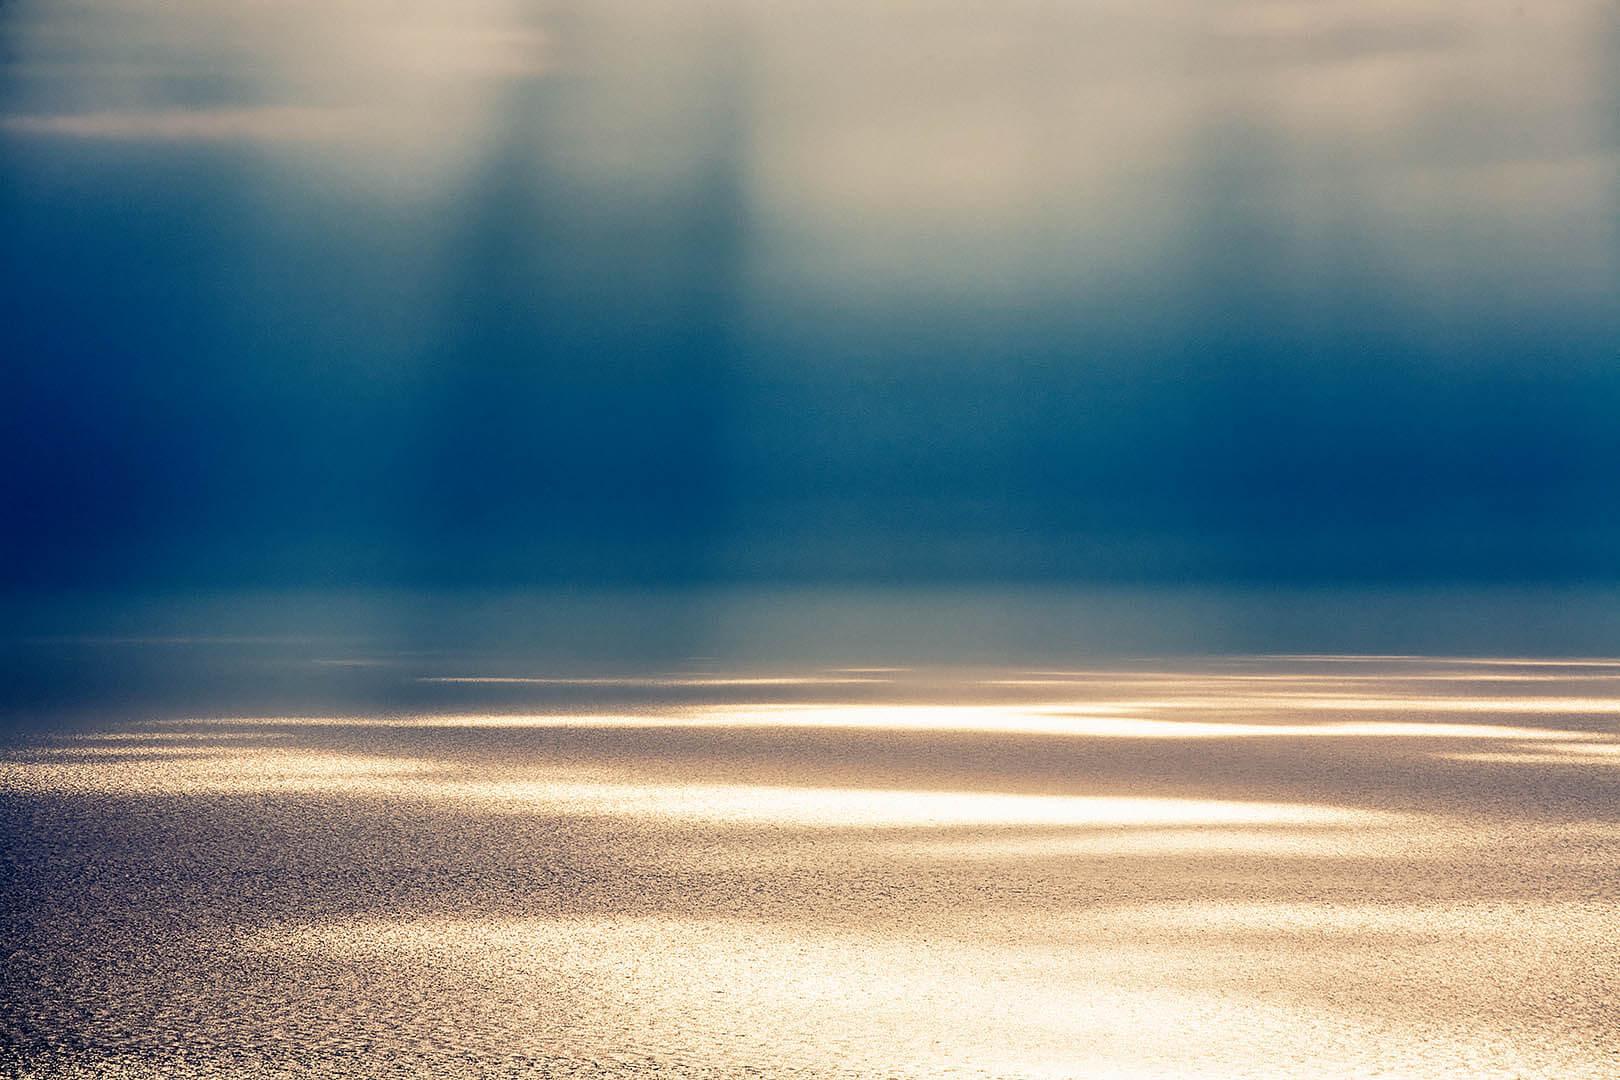 Splashes of Light I